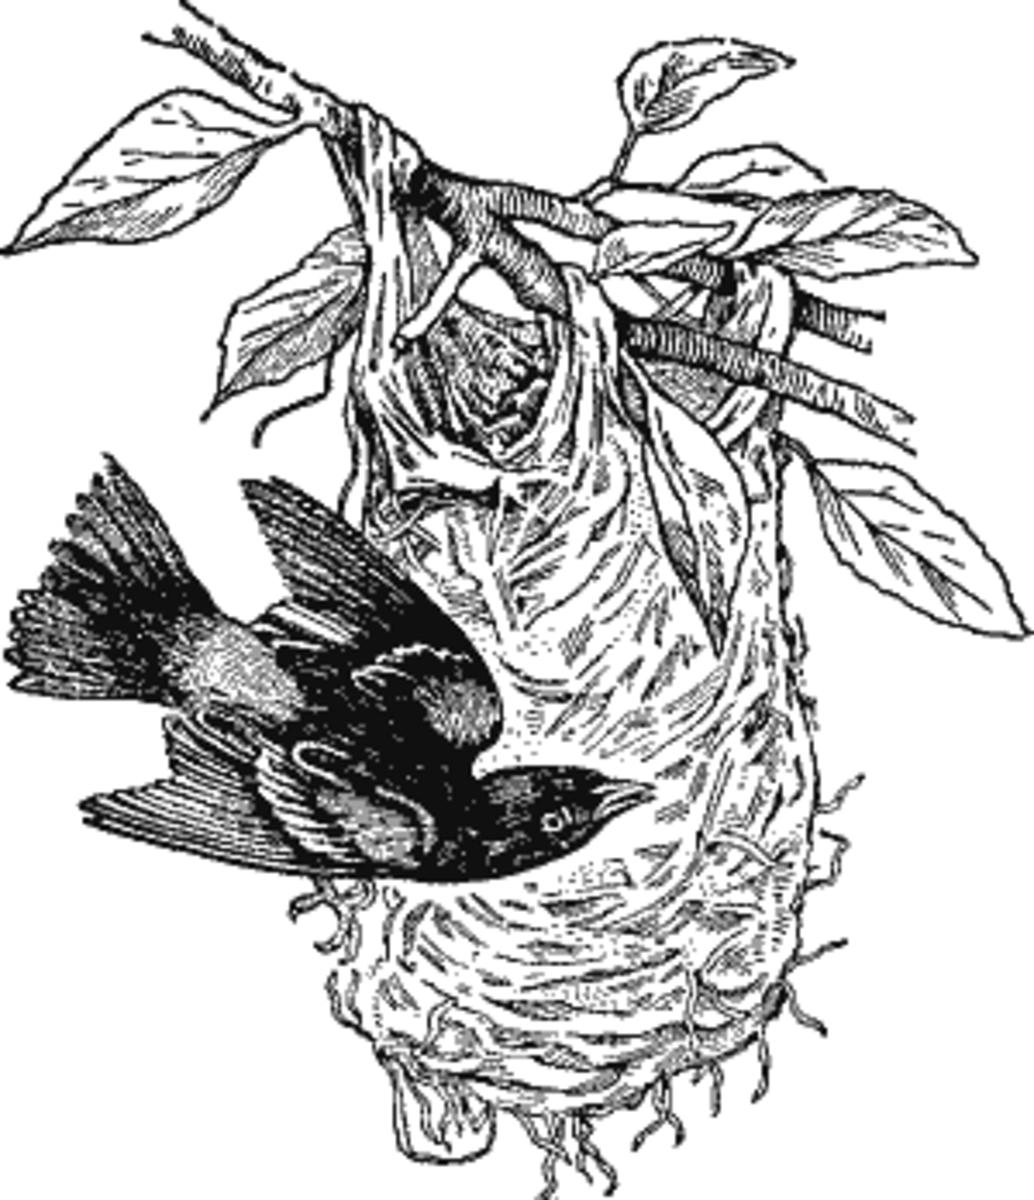 Baltlmore Oriole Nest